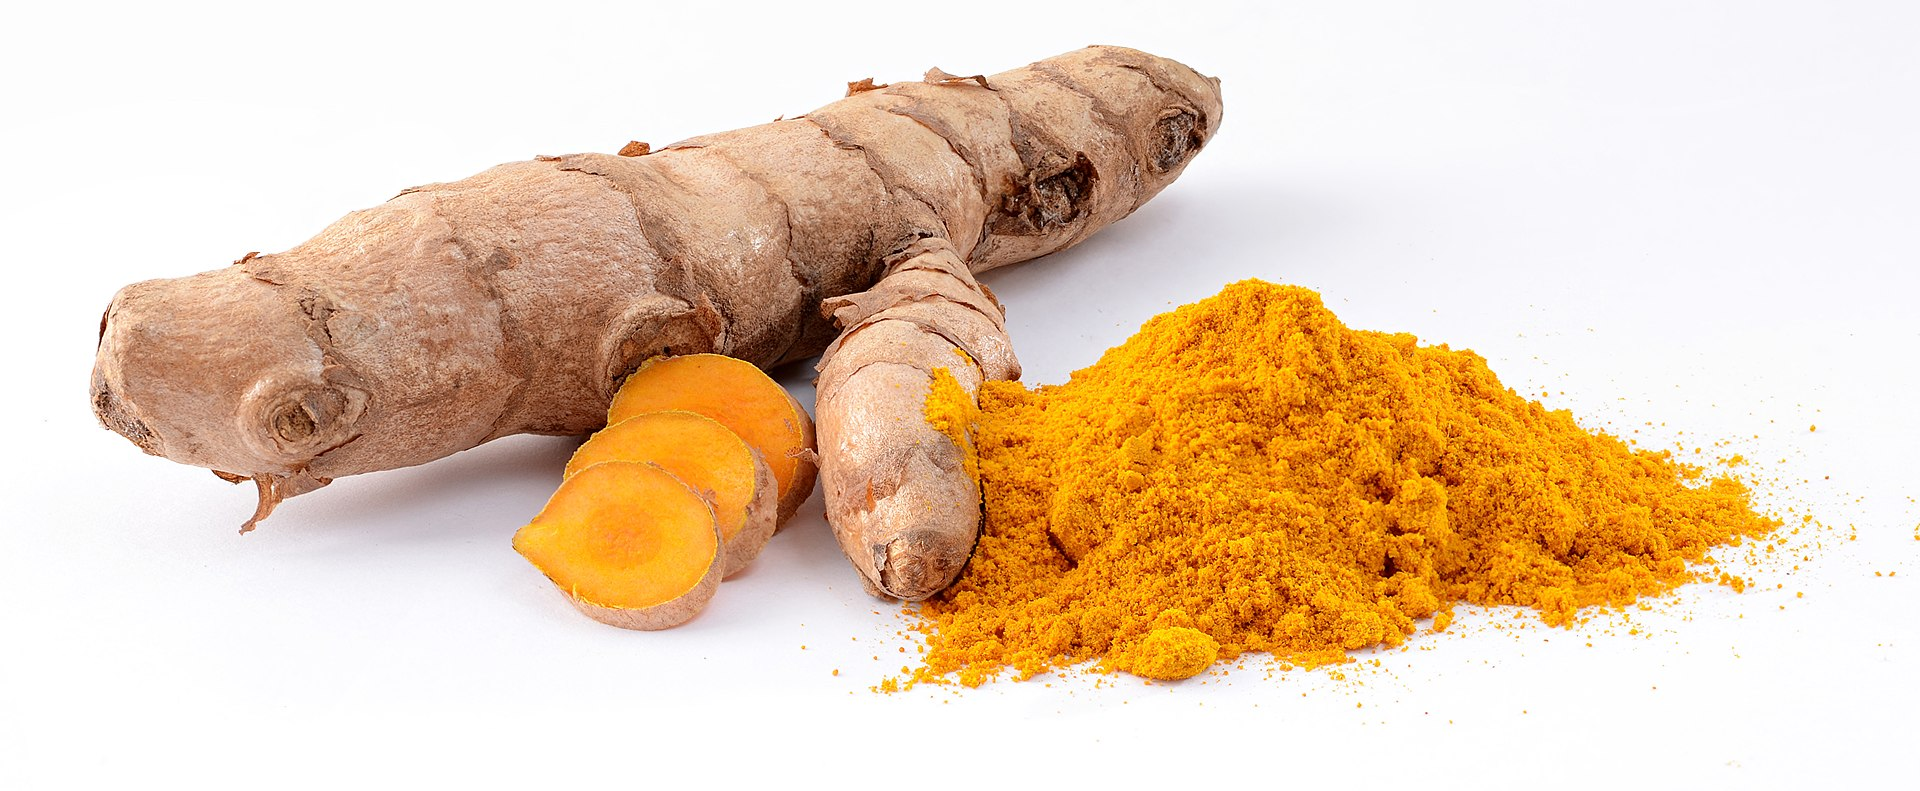 Photograph of knobby brown rhizome and orange powder